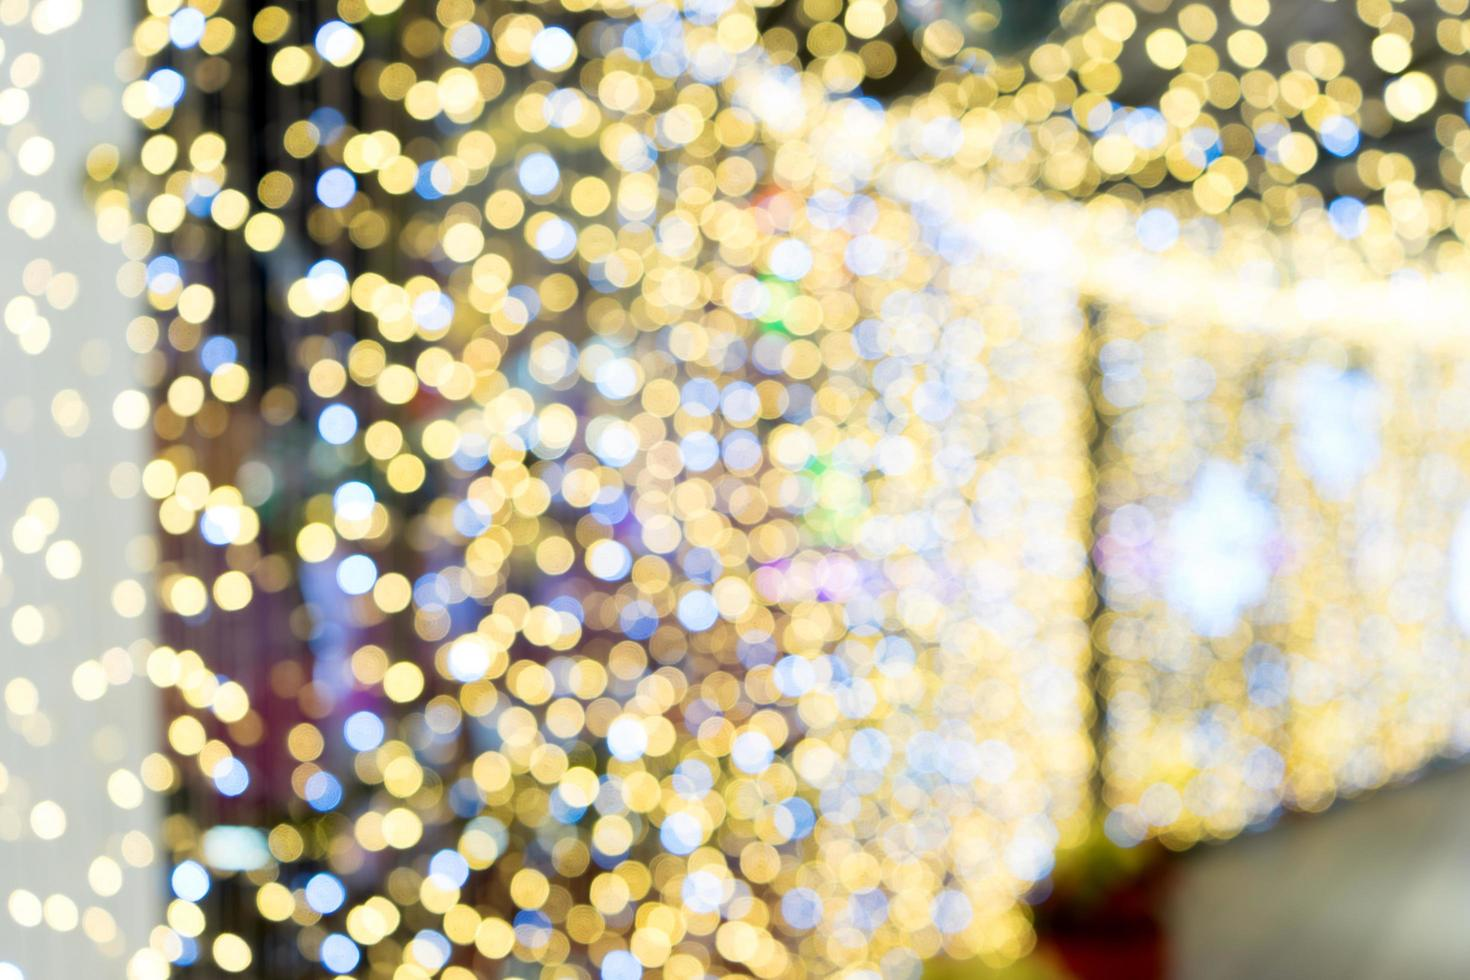 luci natalizie bokeh di notte foto